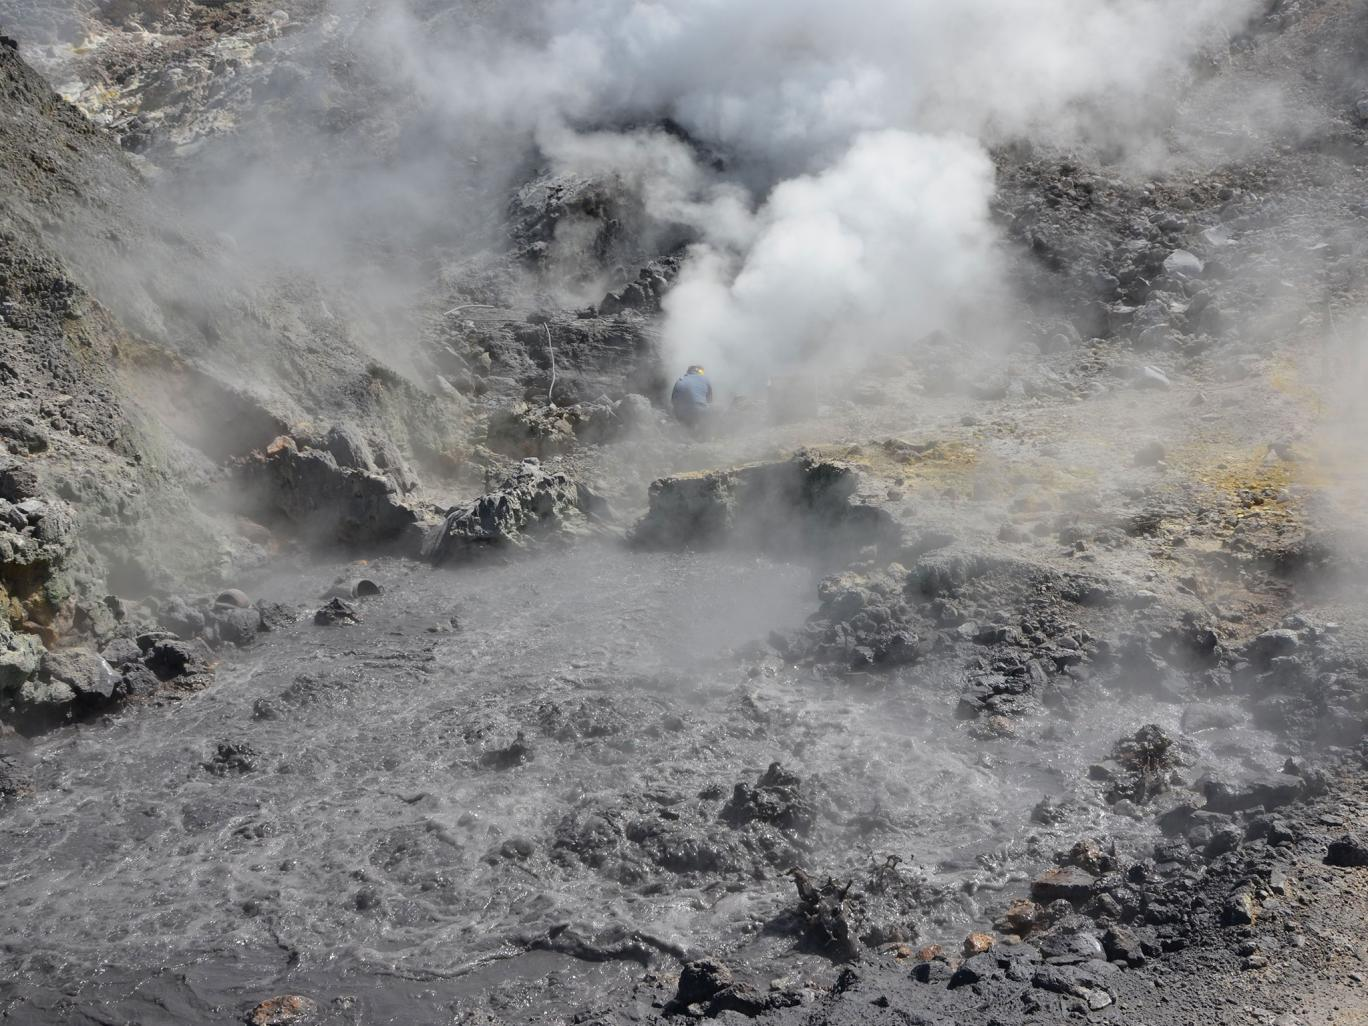 Pisciarelli fumaroles and mud pools from the Campi Flegrei caldera, near Naples/GETTY IMAGES